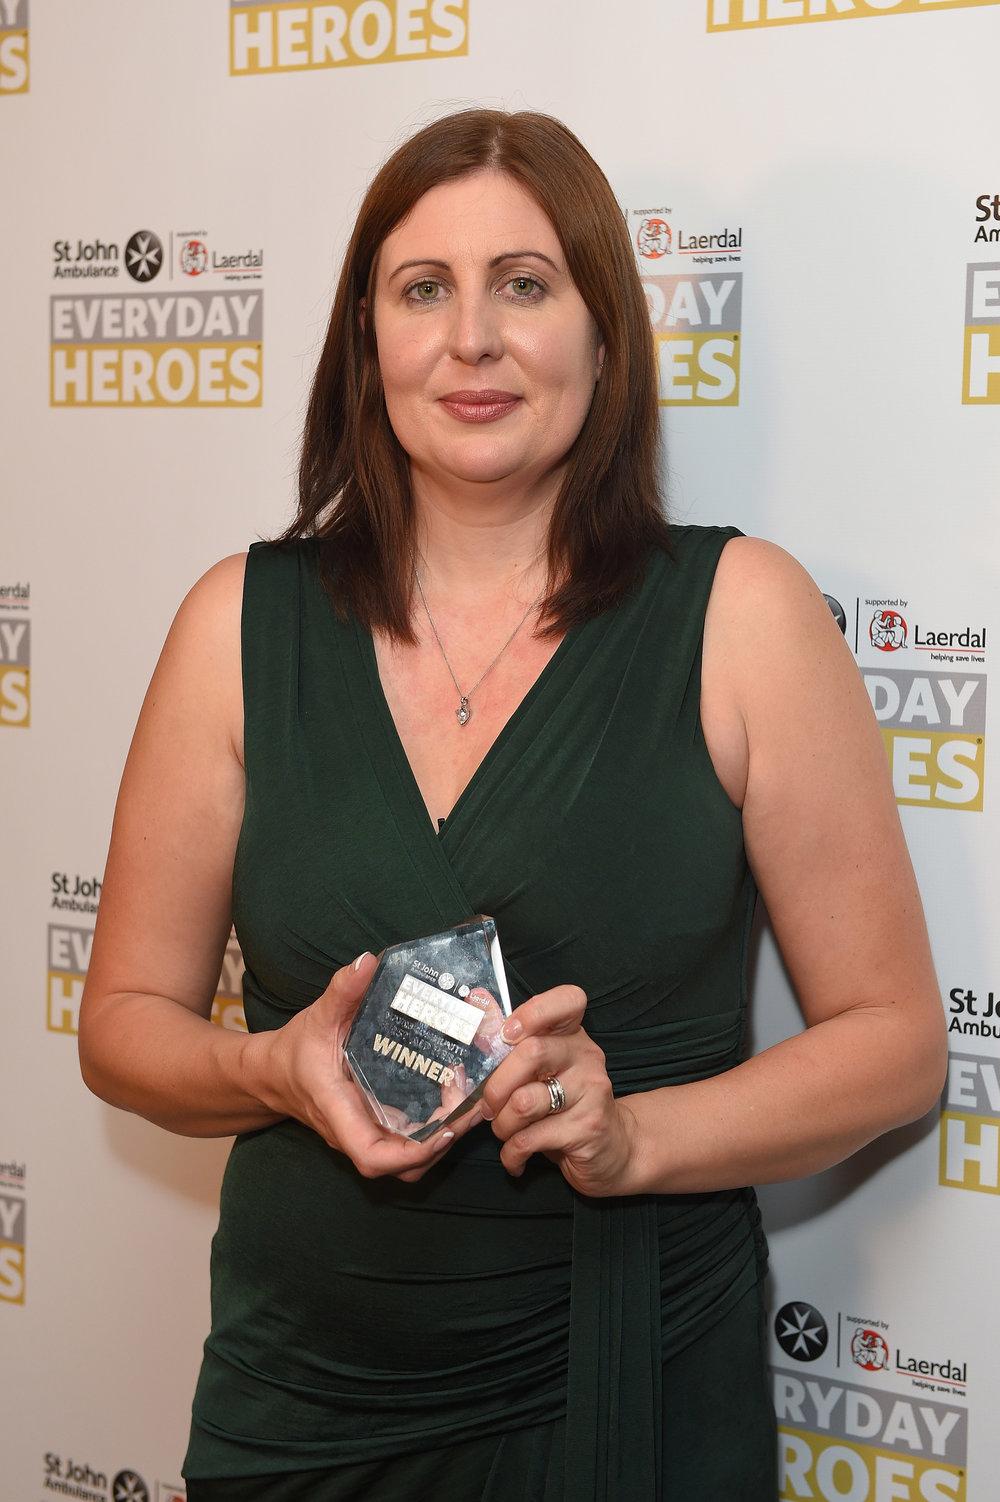 The amazing Natasha with her award